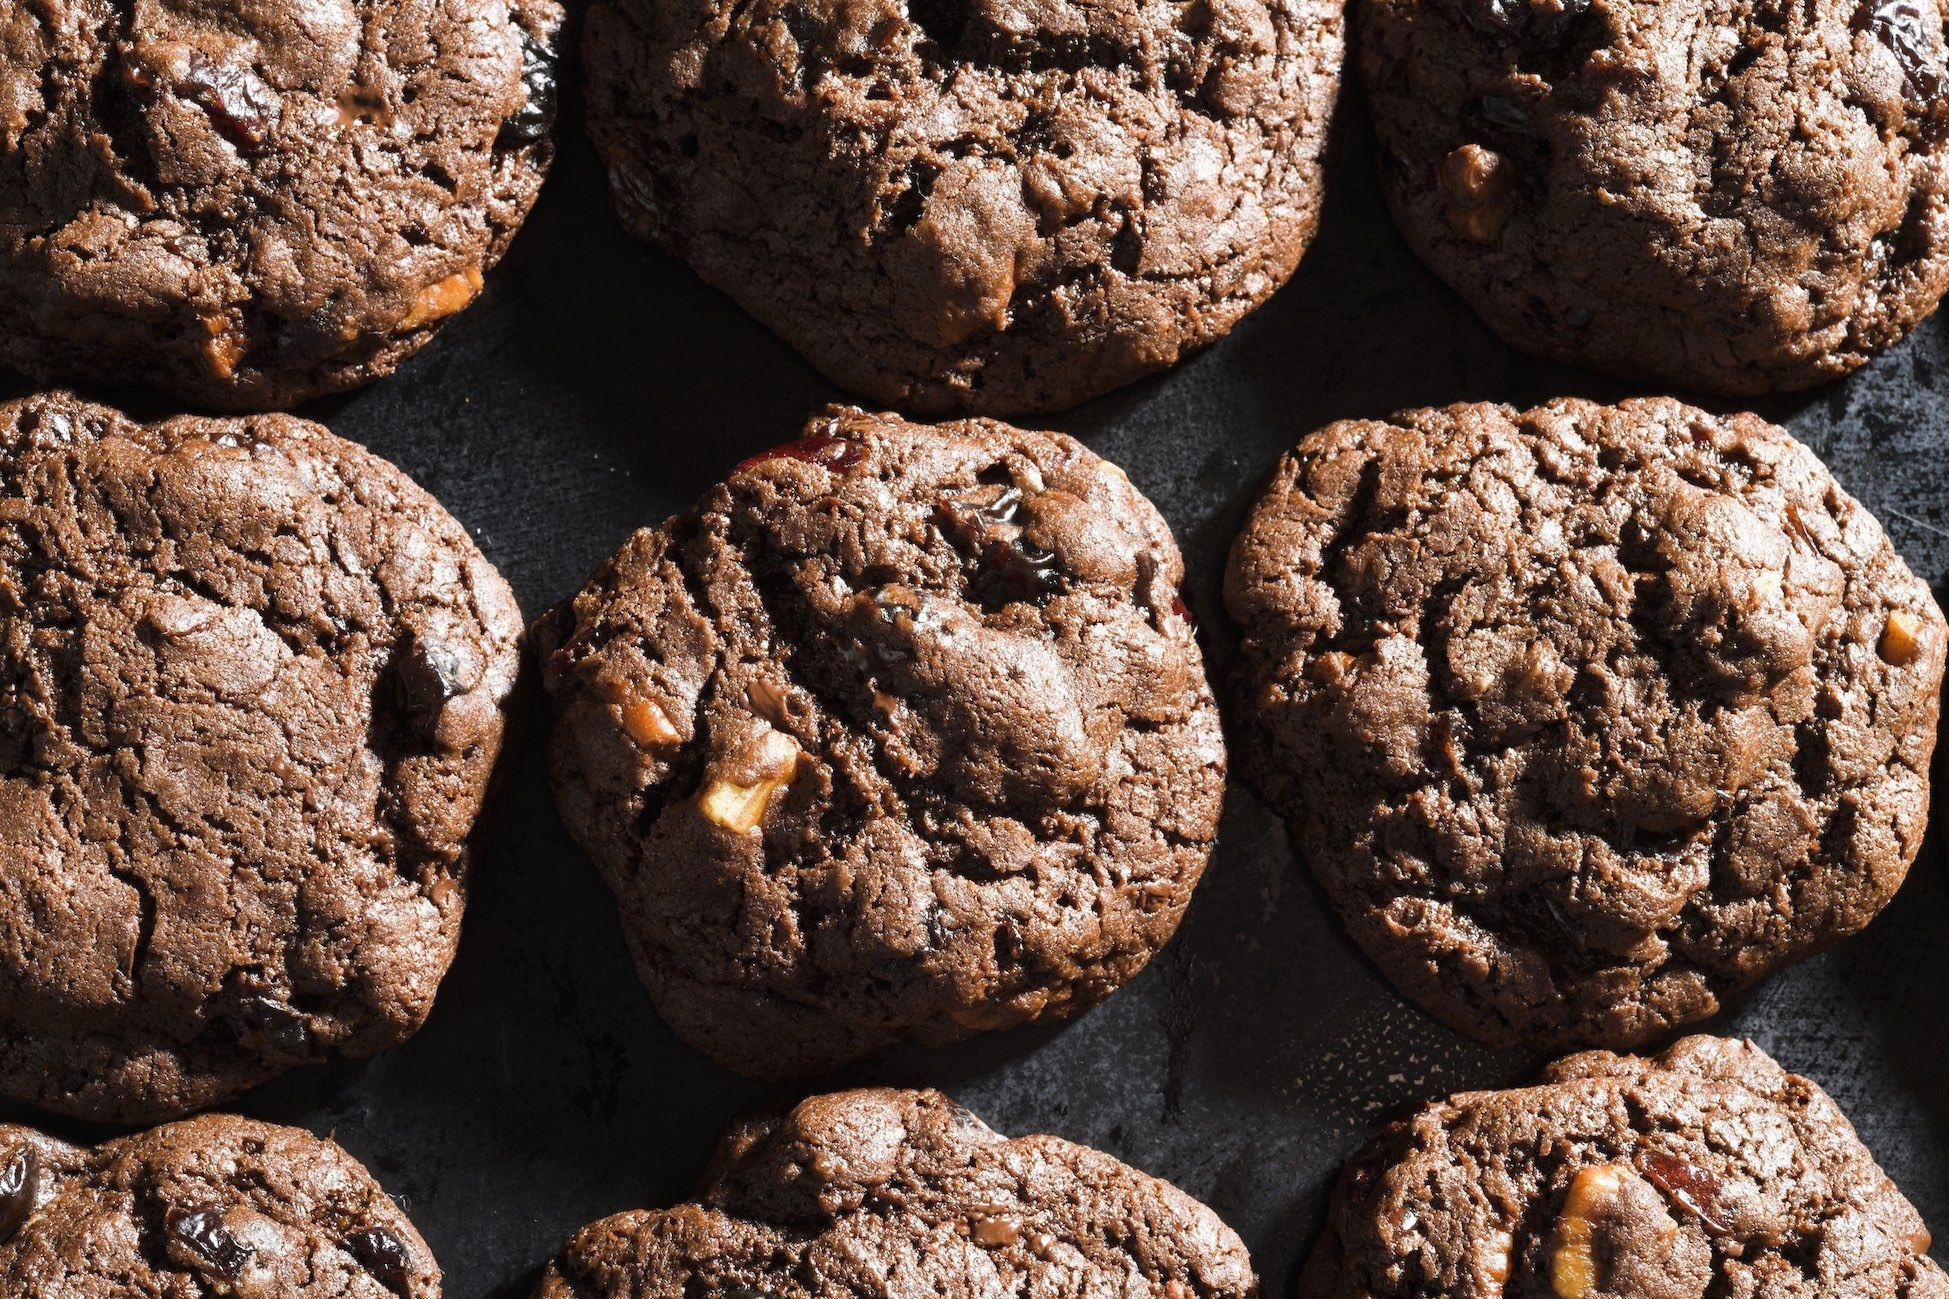 Dried Cherry–Chocolate Chunk Cookies